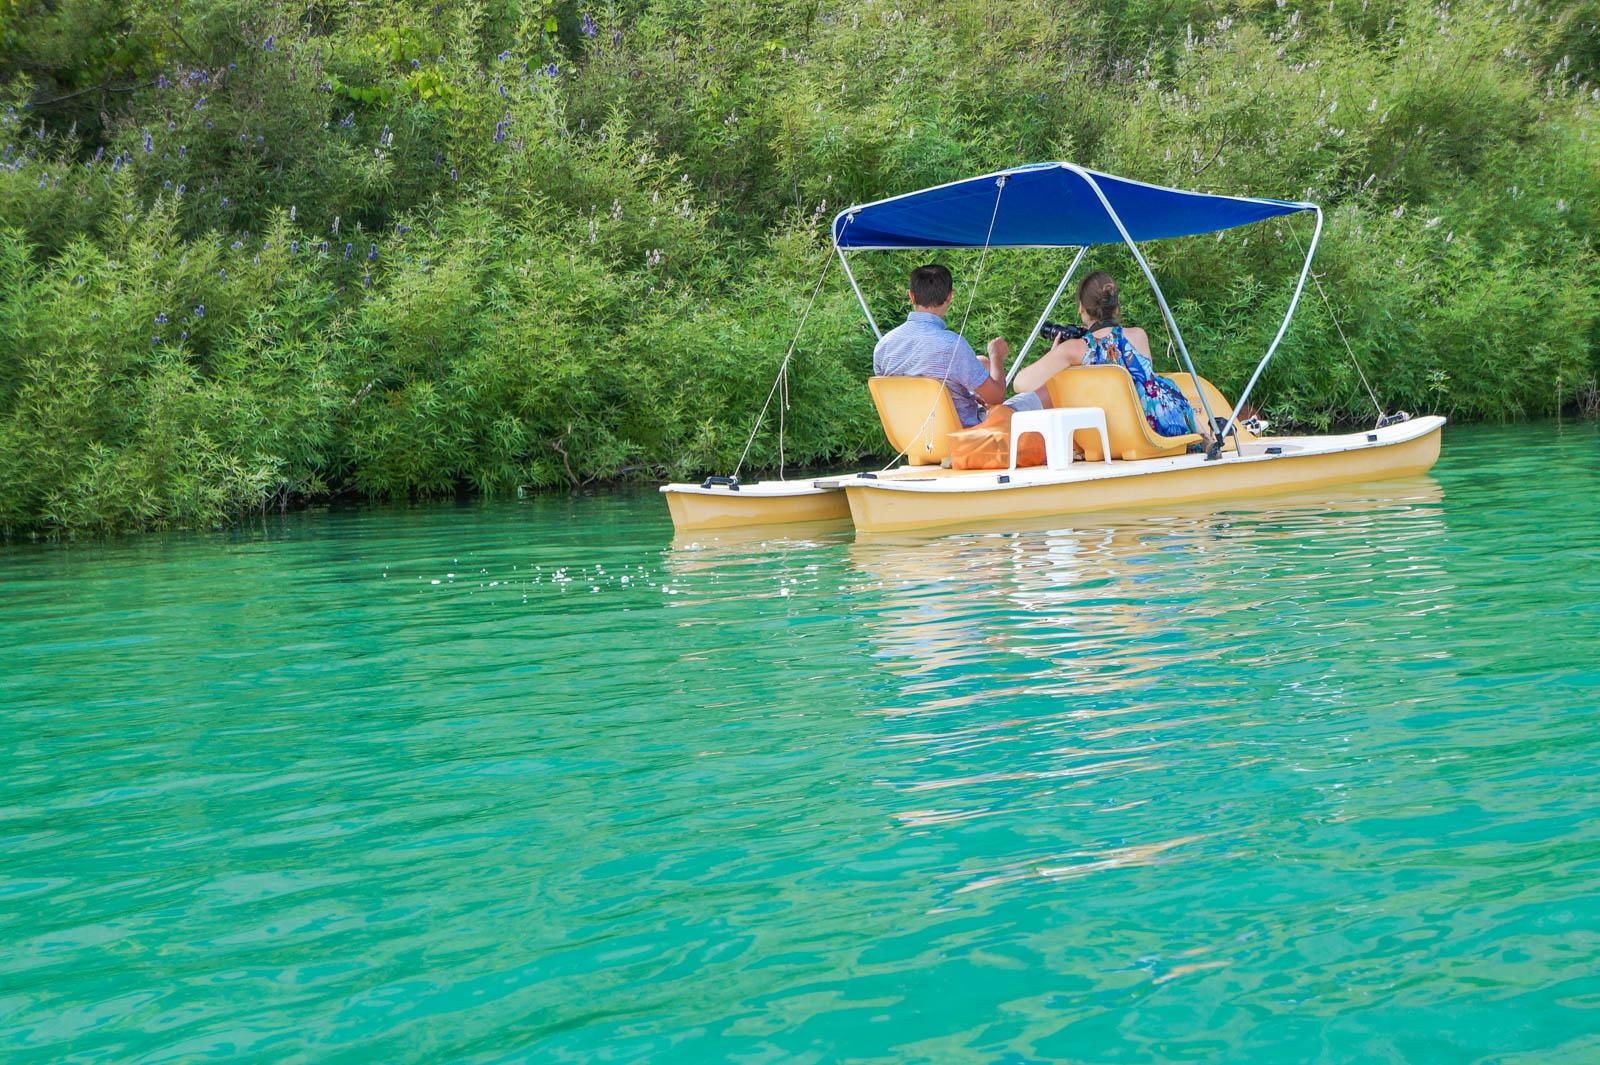 kourna-lake-crete-greece-la-vie-en-blog-all-rights-reserved-11